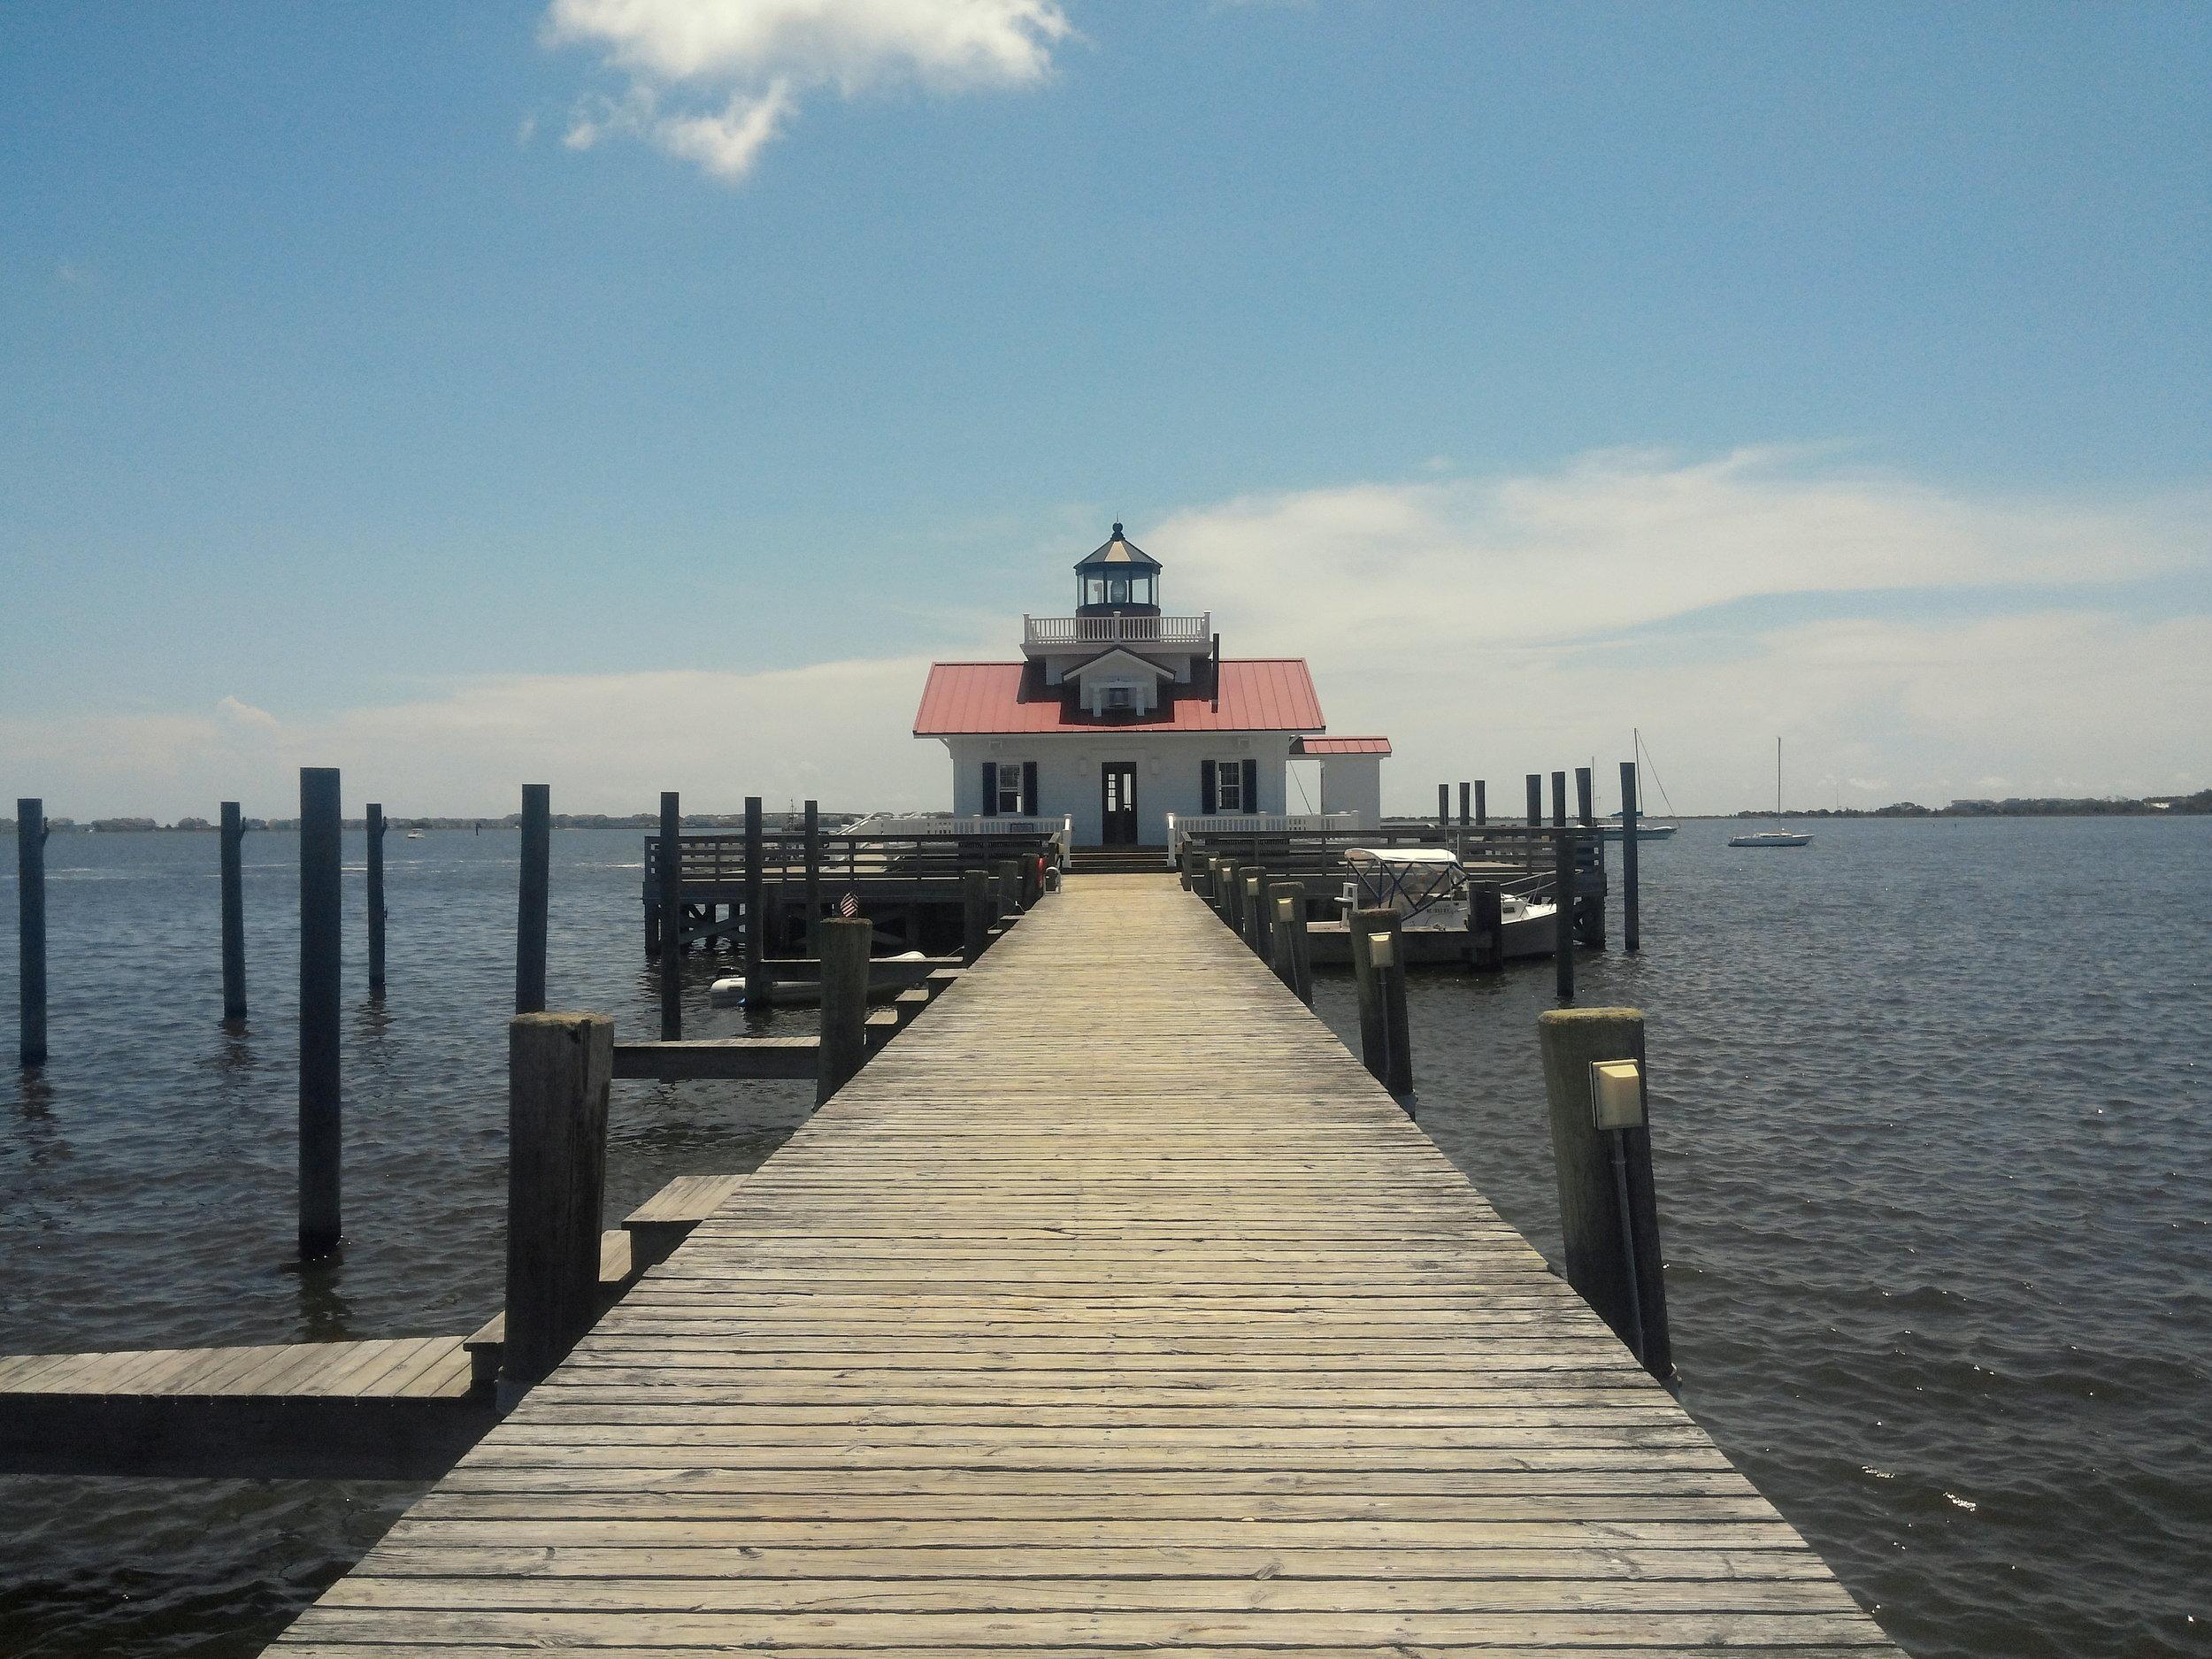 The Roanoke Marshes Lighthouse.